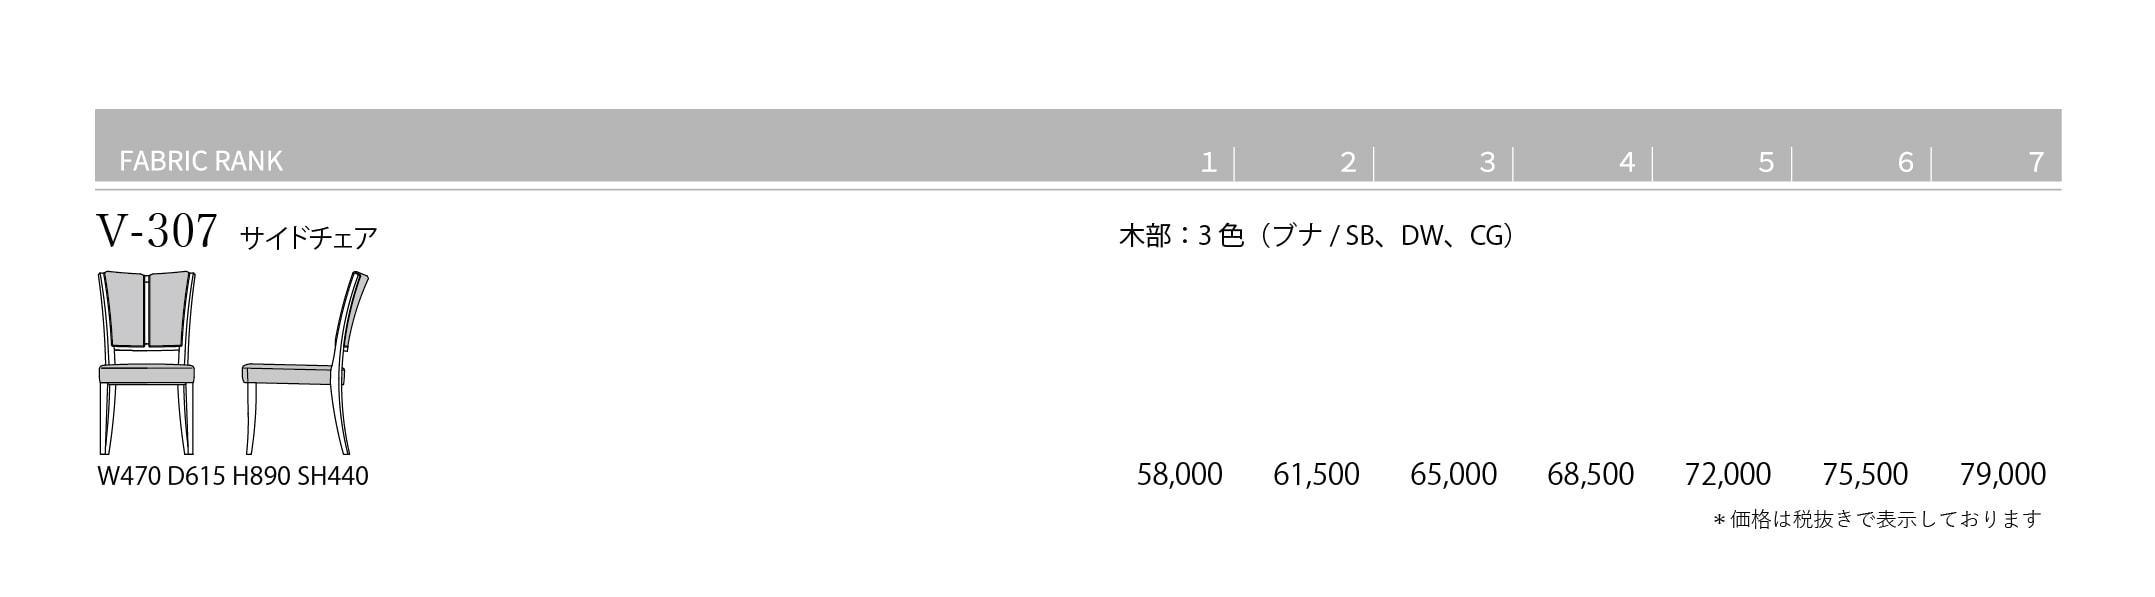 V-307 Price List